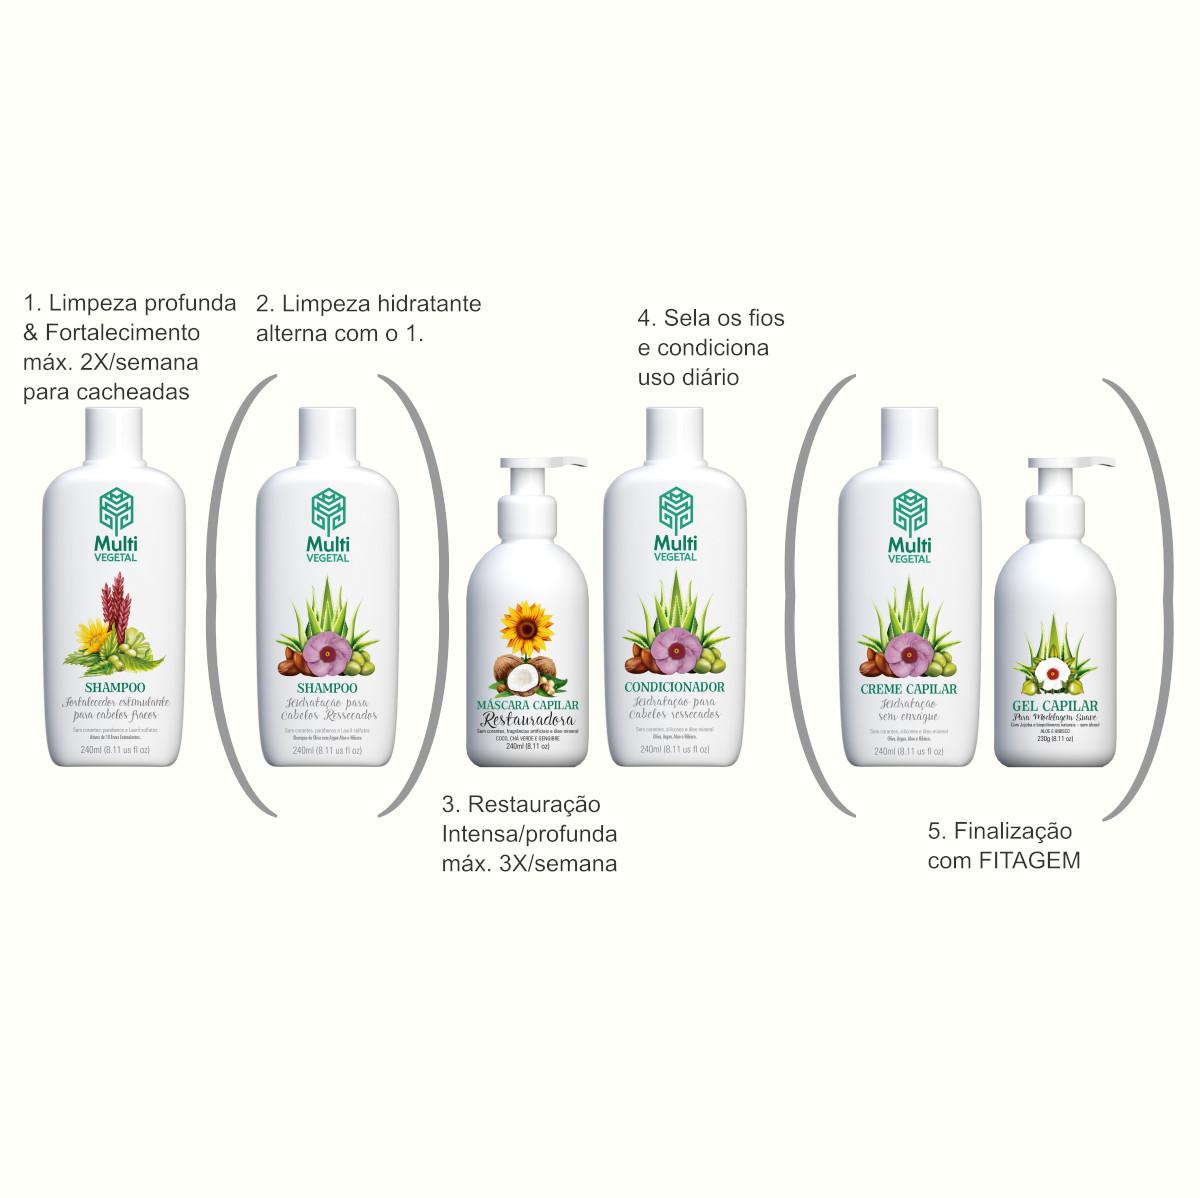 Combo Cacheadas Limpeza + Fortalecimento + Hidratação profunda + Fitagem Multi Vegetal